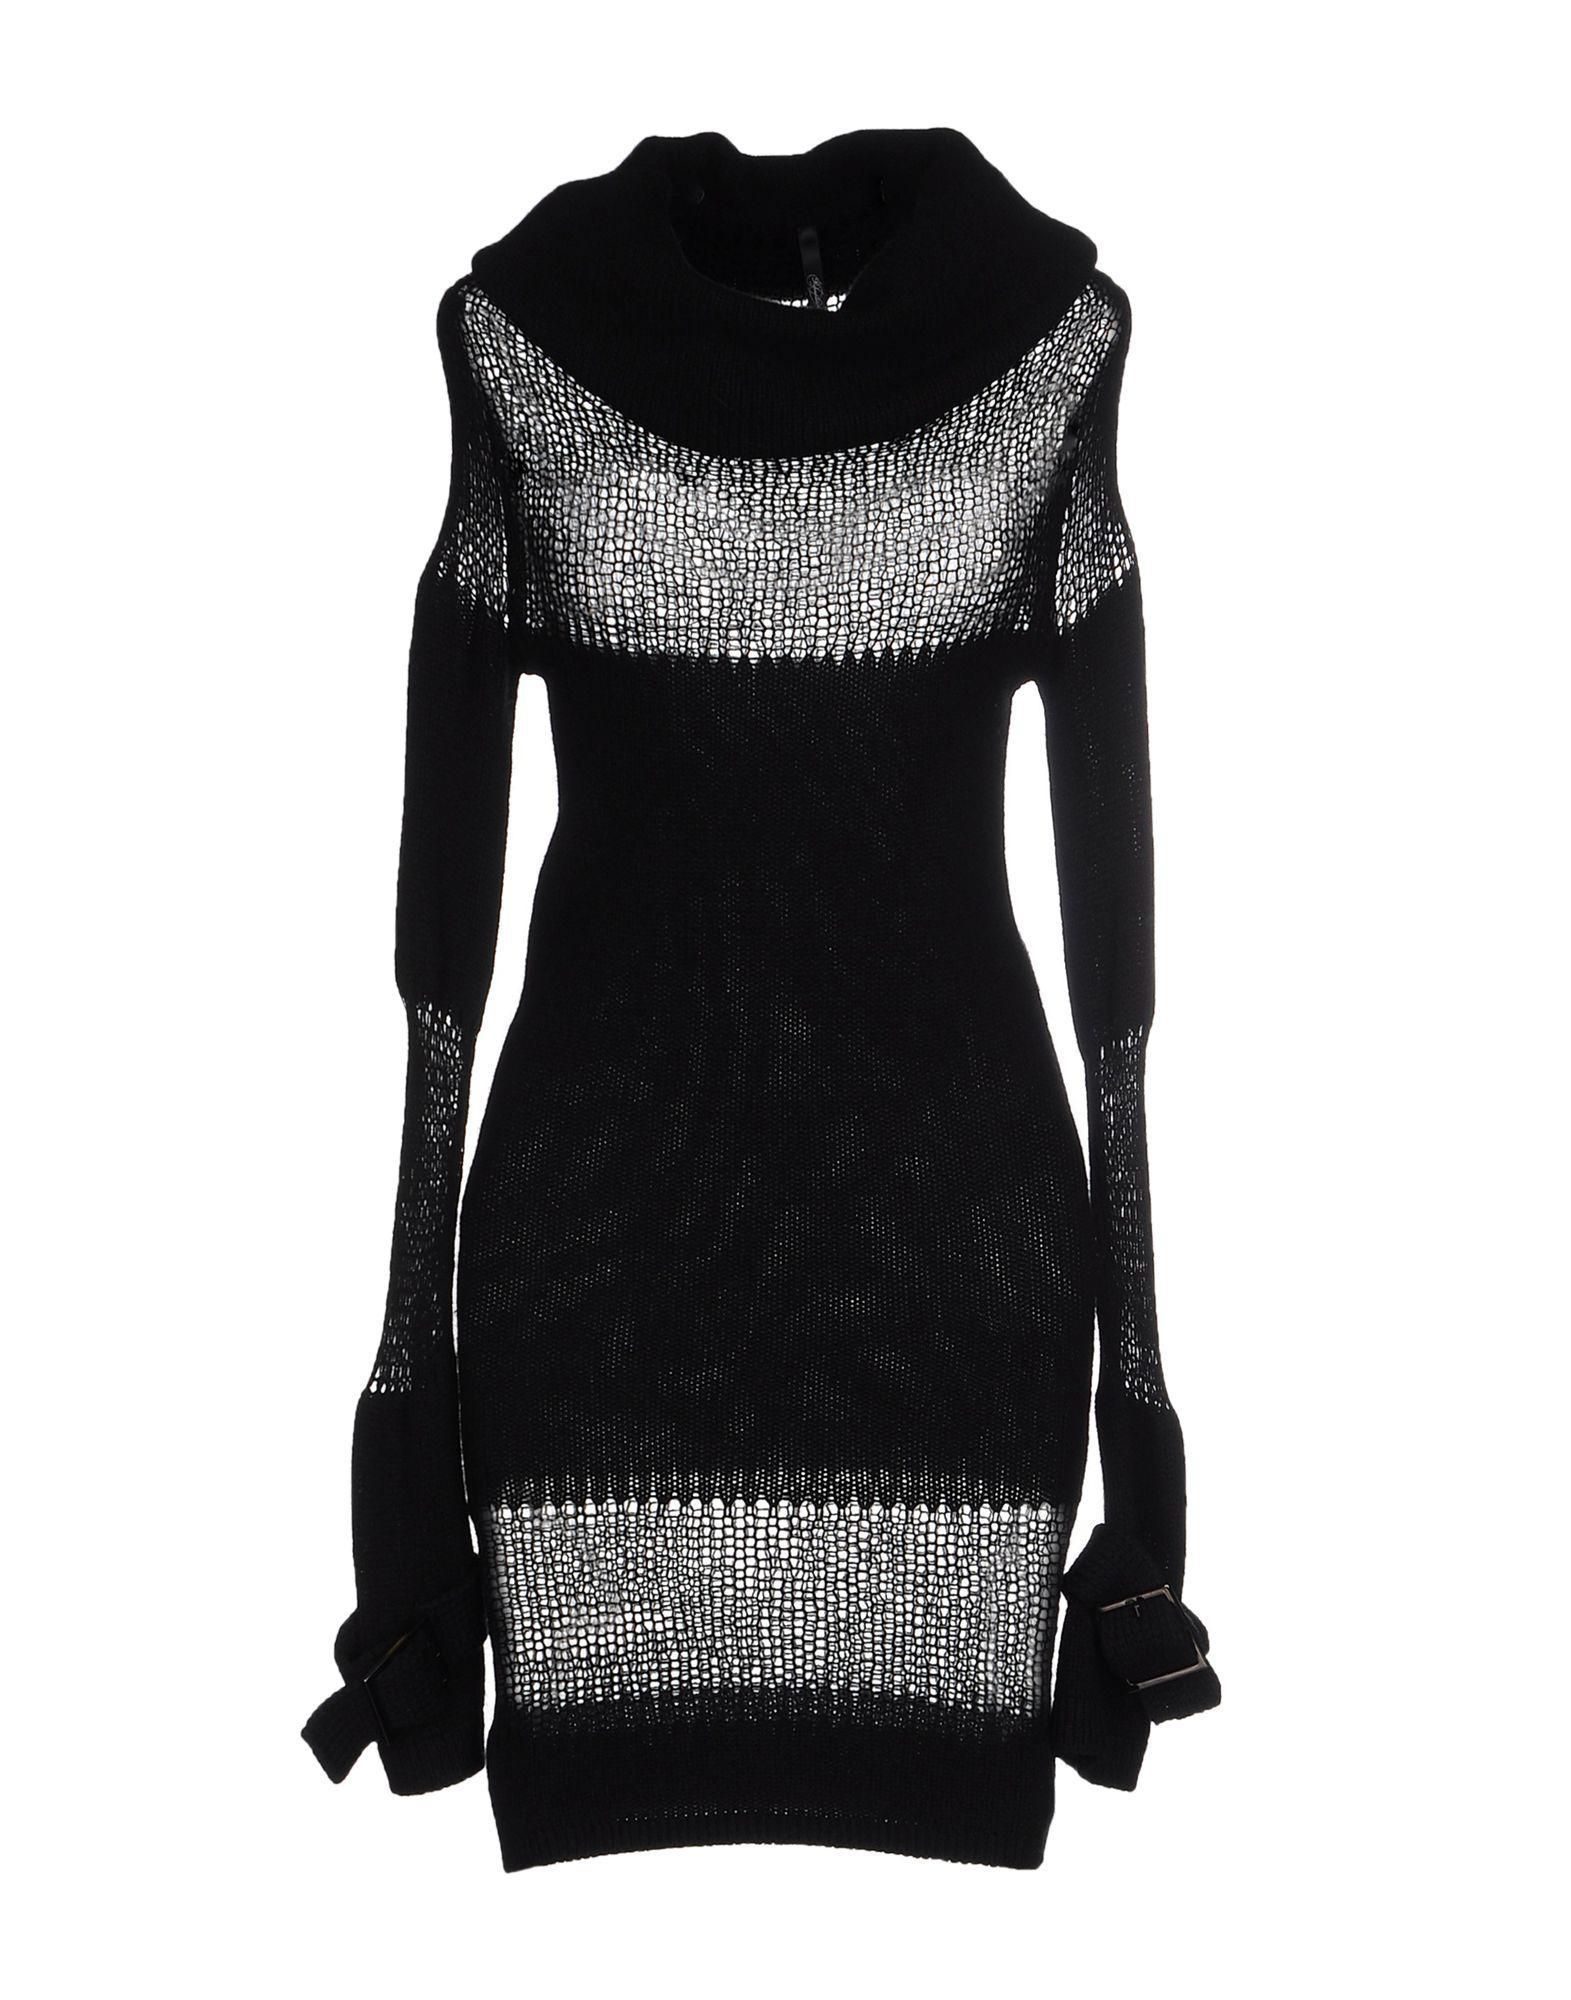 DRESSES - Short dresses Redemption 2uP8r759